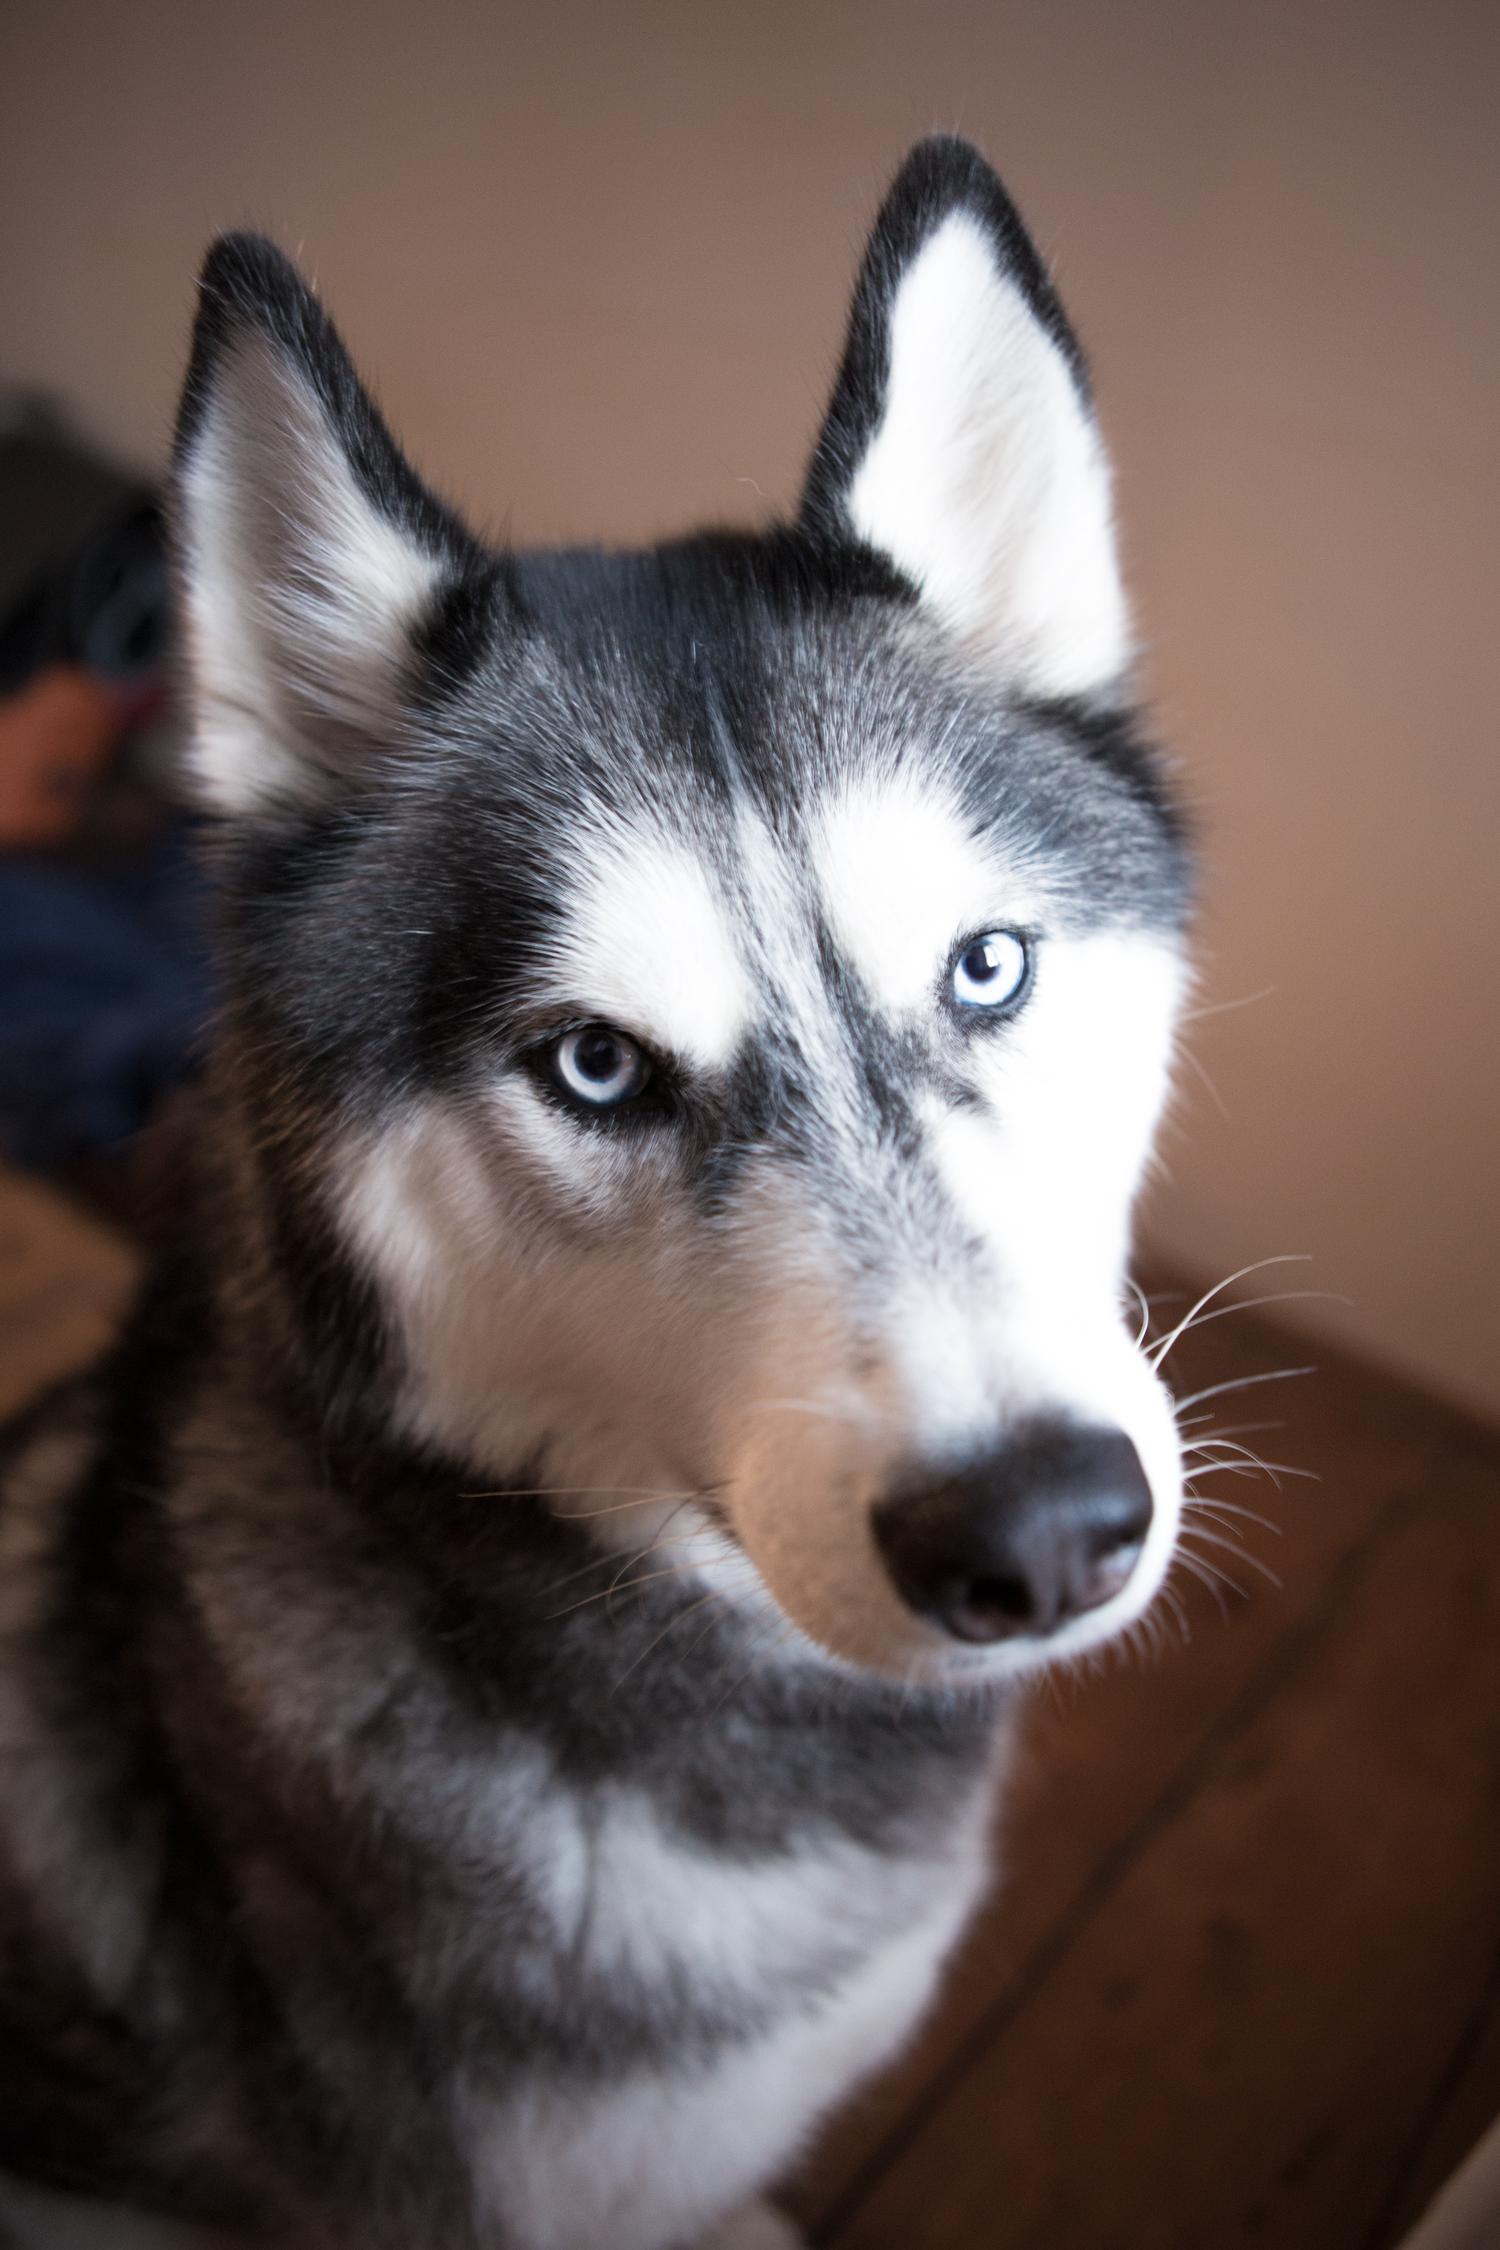 My siberian husky turned 6 this week